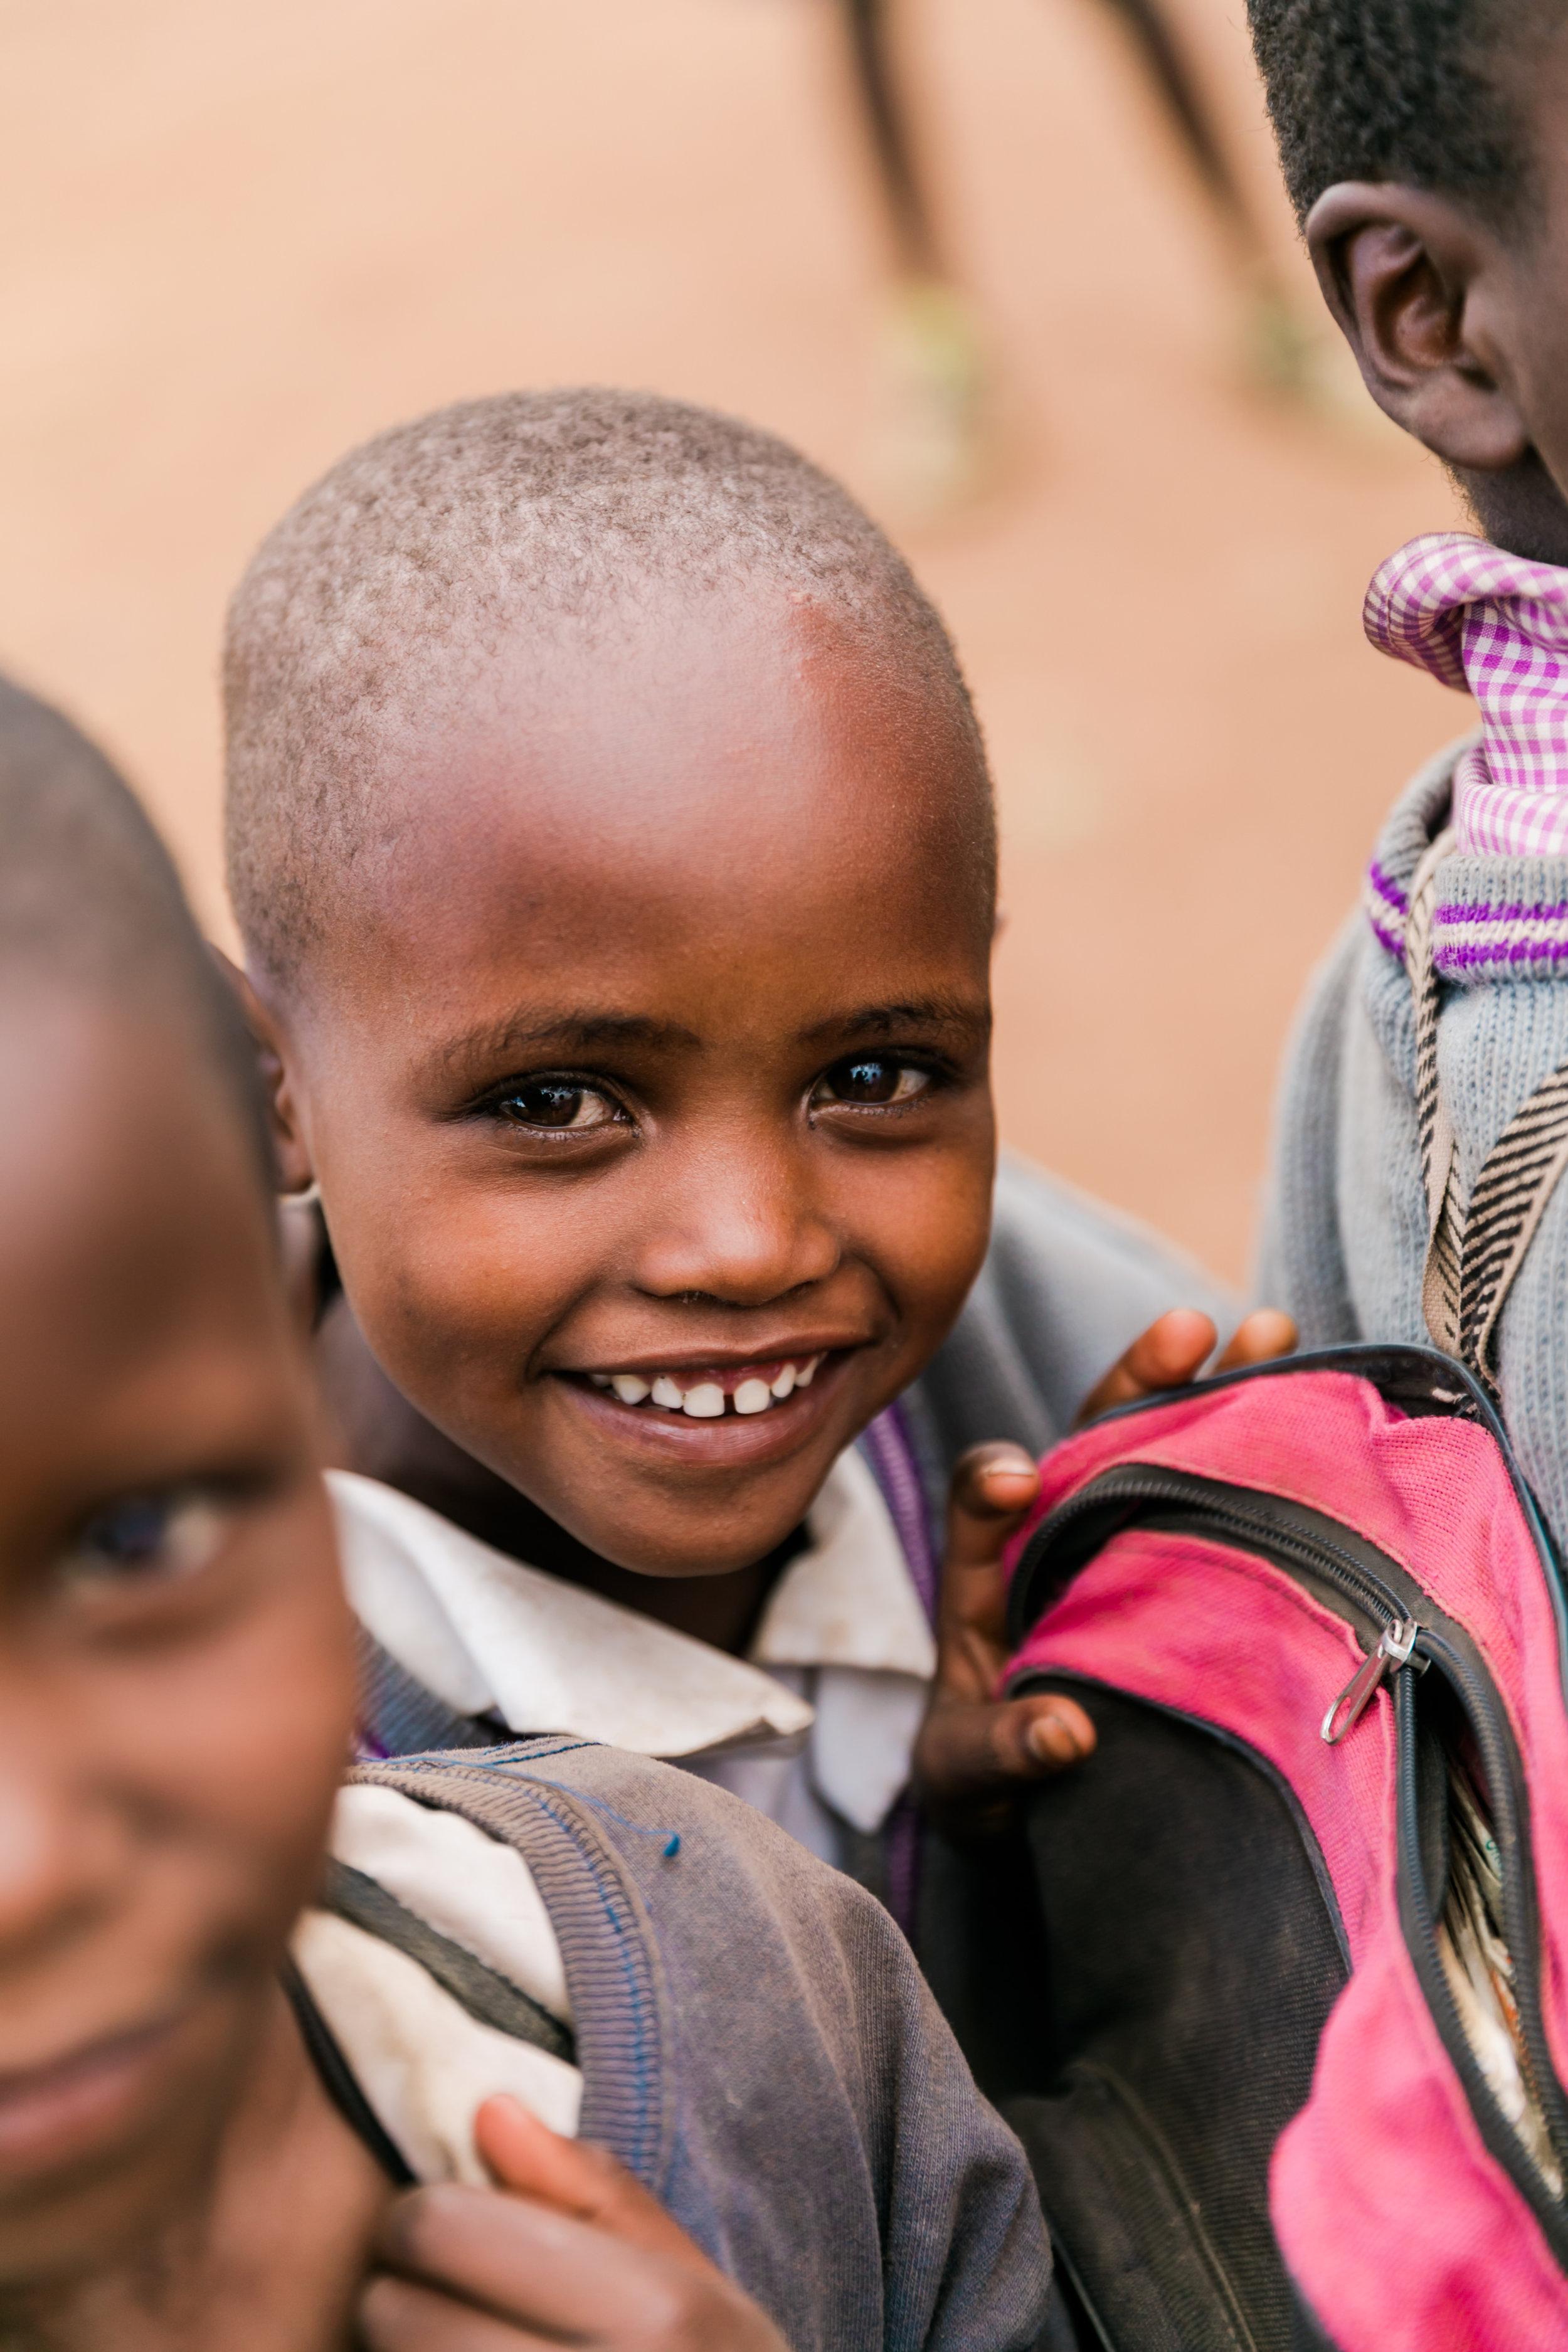 School visit on Safari In Kenya - Ph. Valorie Darling